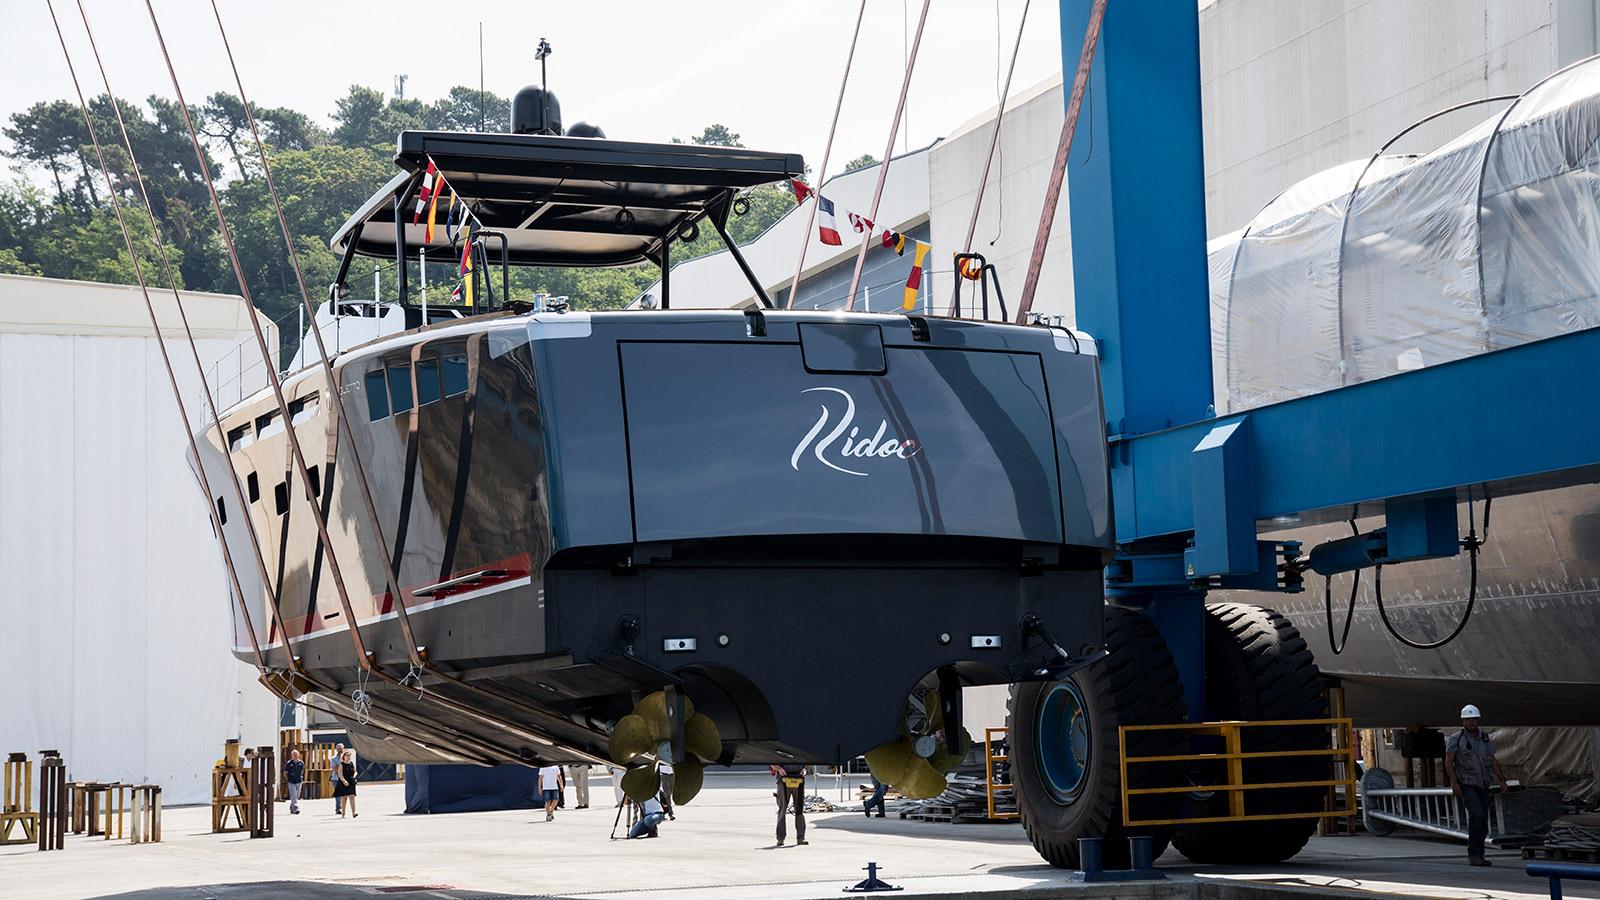 aft-view-of-the-baglietto-mv19-dayboat-ridoc